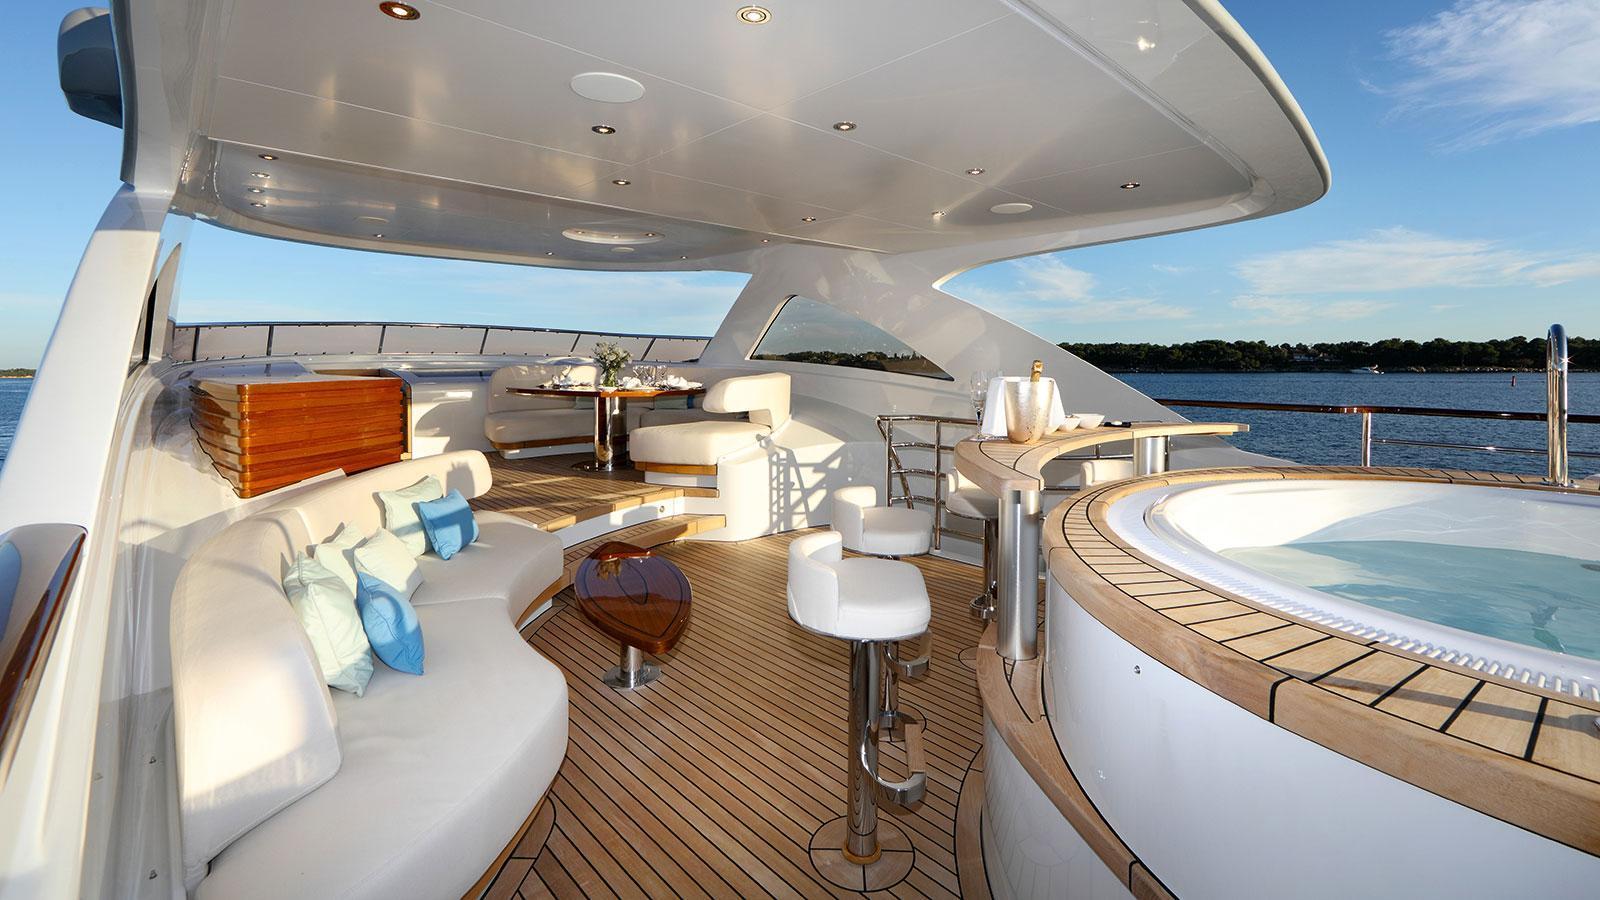 solis-motor-yacht-mulder-2015-34m-jacuzzi-seating